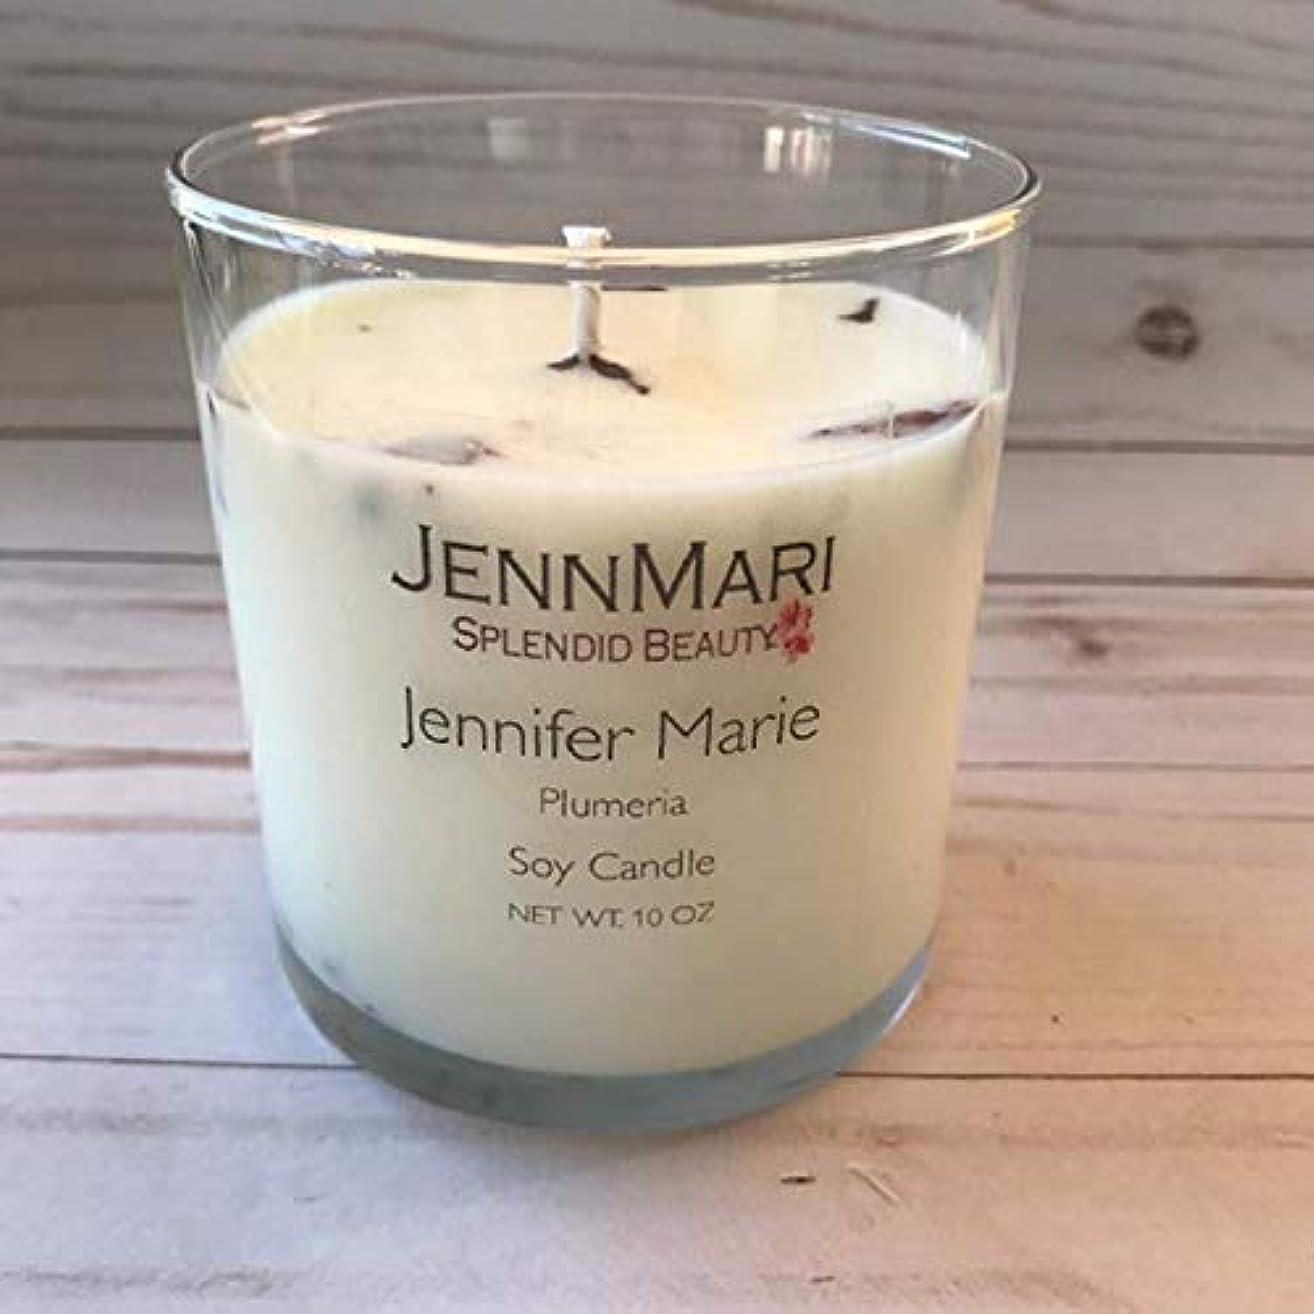 Splendid Beauty   Plumeria Scented Soy Candle Glass Jar   10 Oz   Handmade   Eco-friendly   Vegan   Cotton Wick   100% Soy Wax